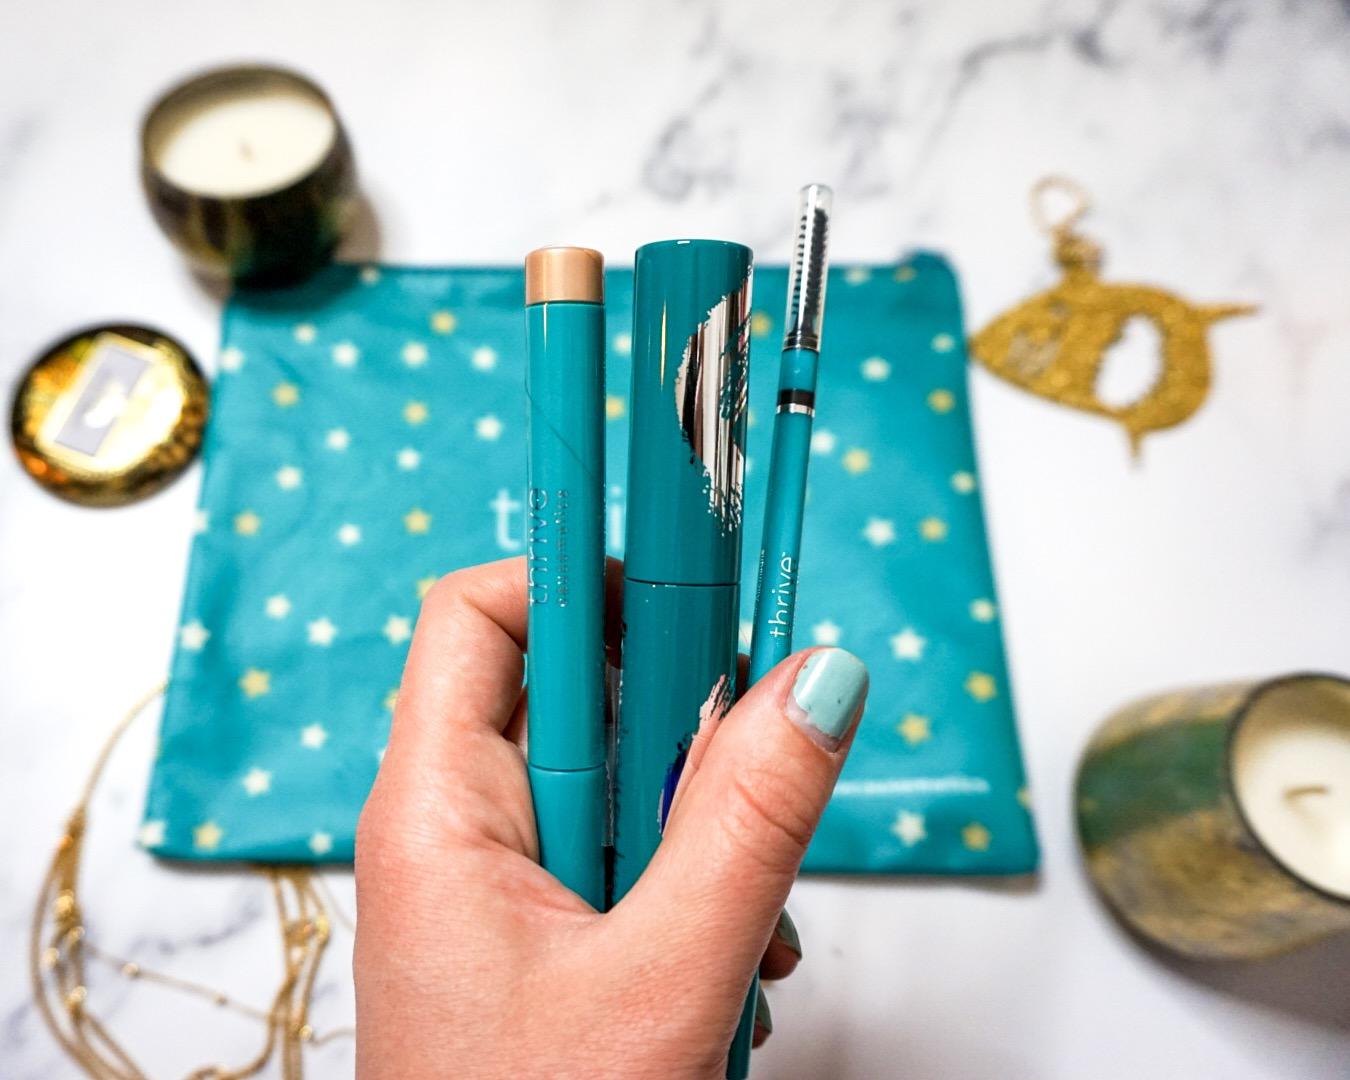 Newbie Awards 2019 | Best of Beauty 2019 | Best Brow 2019 - Thrive Causemetics Brow Liner Pencil